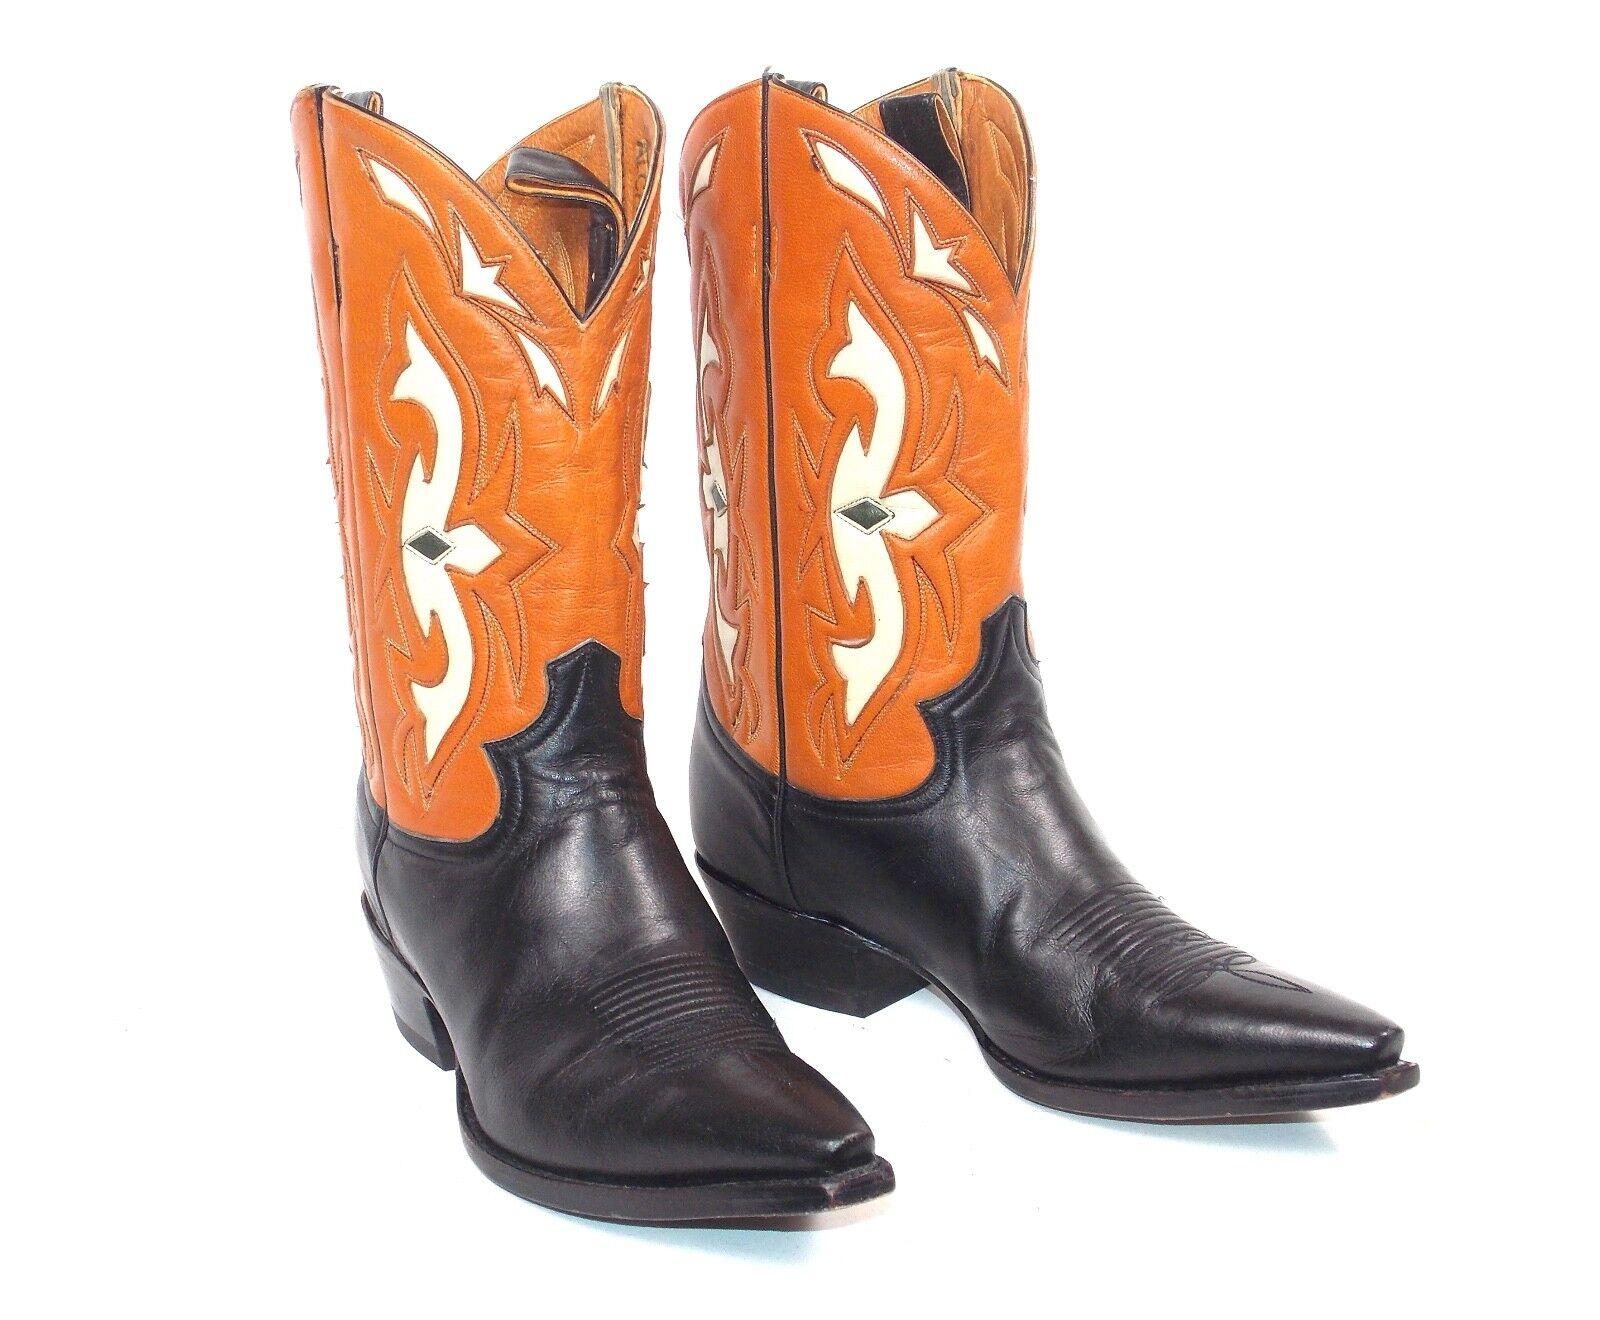 Justin Brown Tan Inlaid Cowboy Boots - Wmns Size 9B Cutout Pee Wee Worn Twice